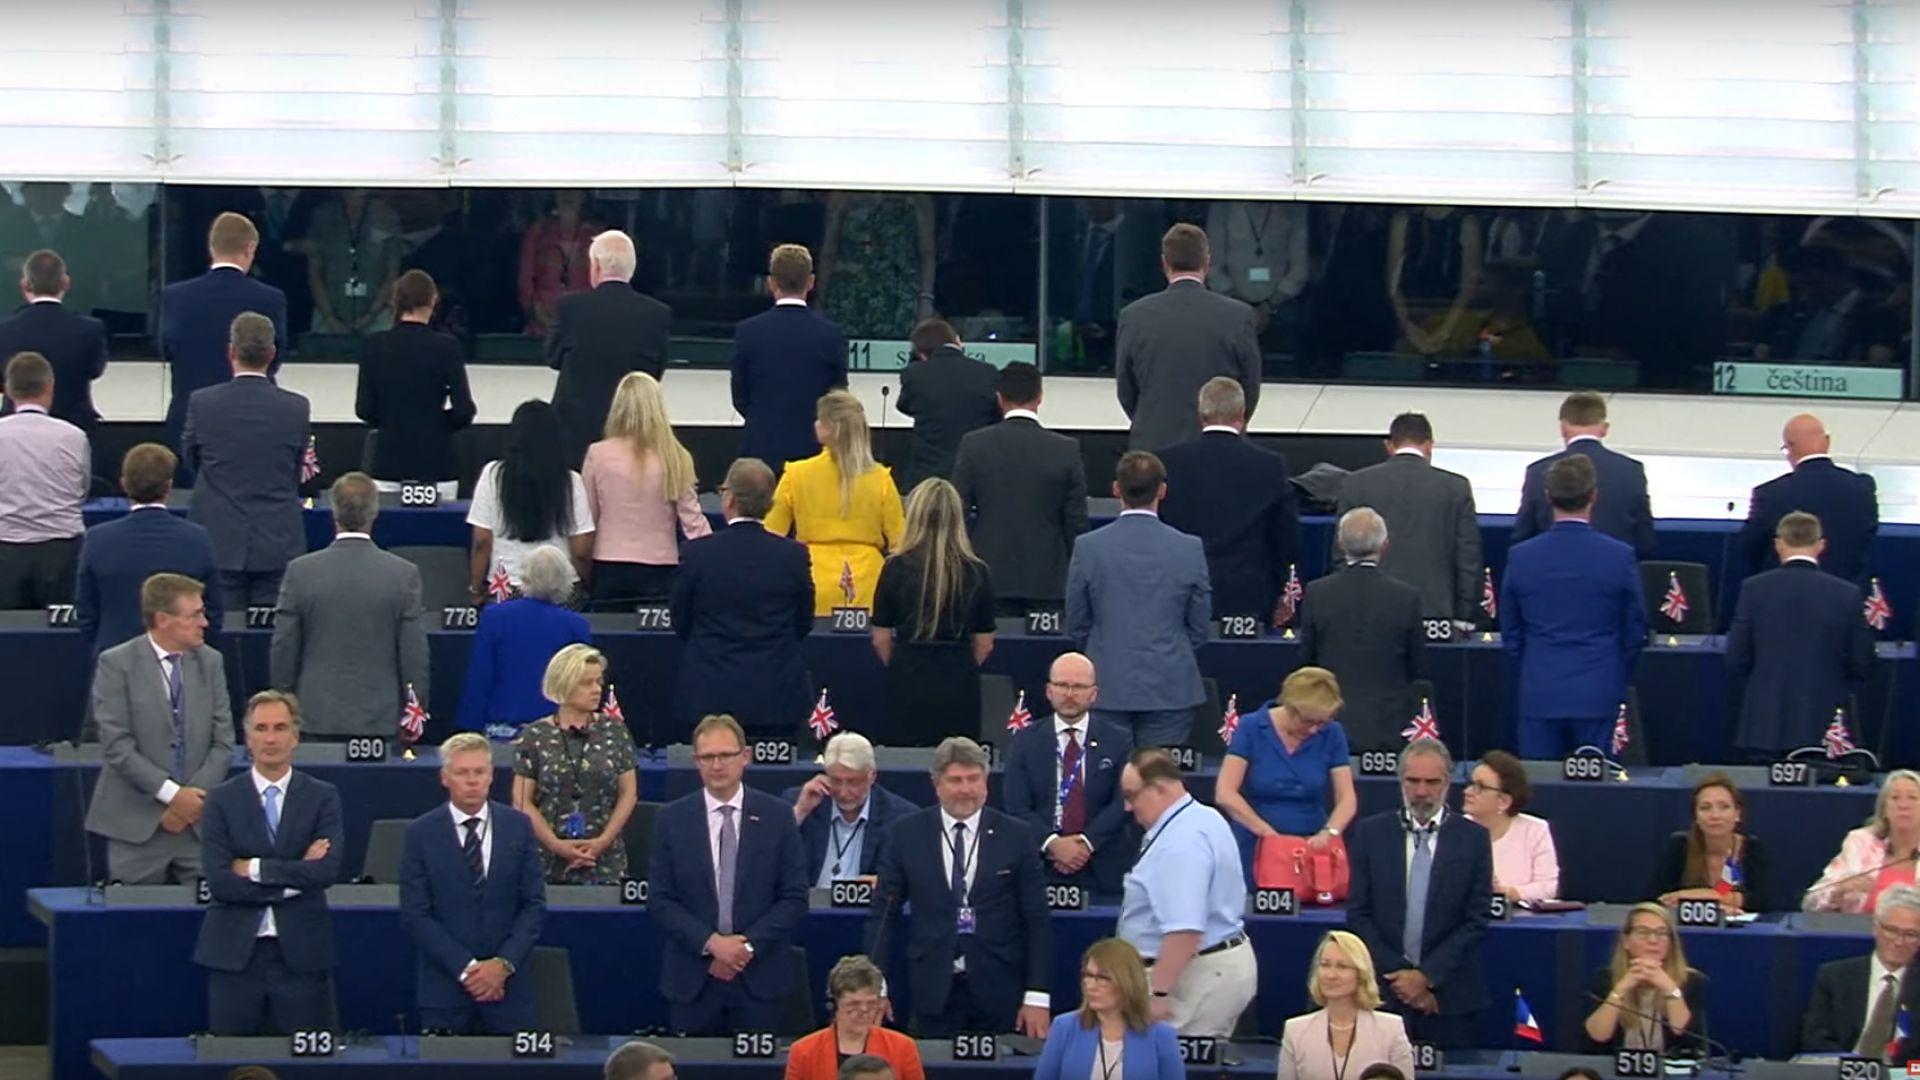 Британски и полски евродепутати обърнаха гръб на химна на Европа (снимки и видео)